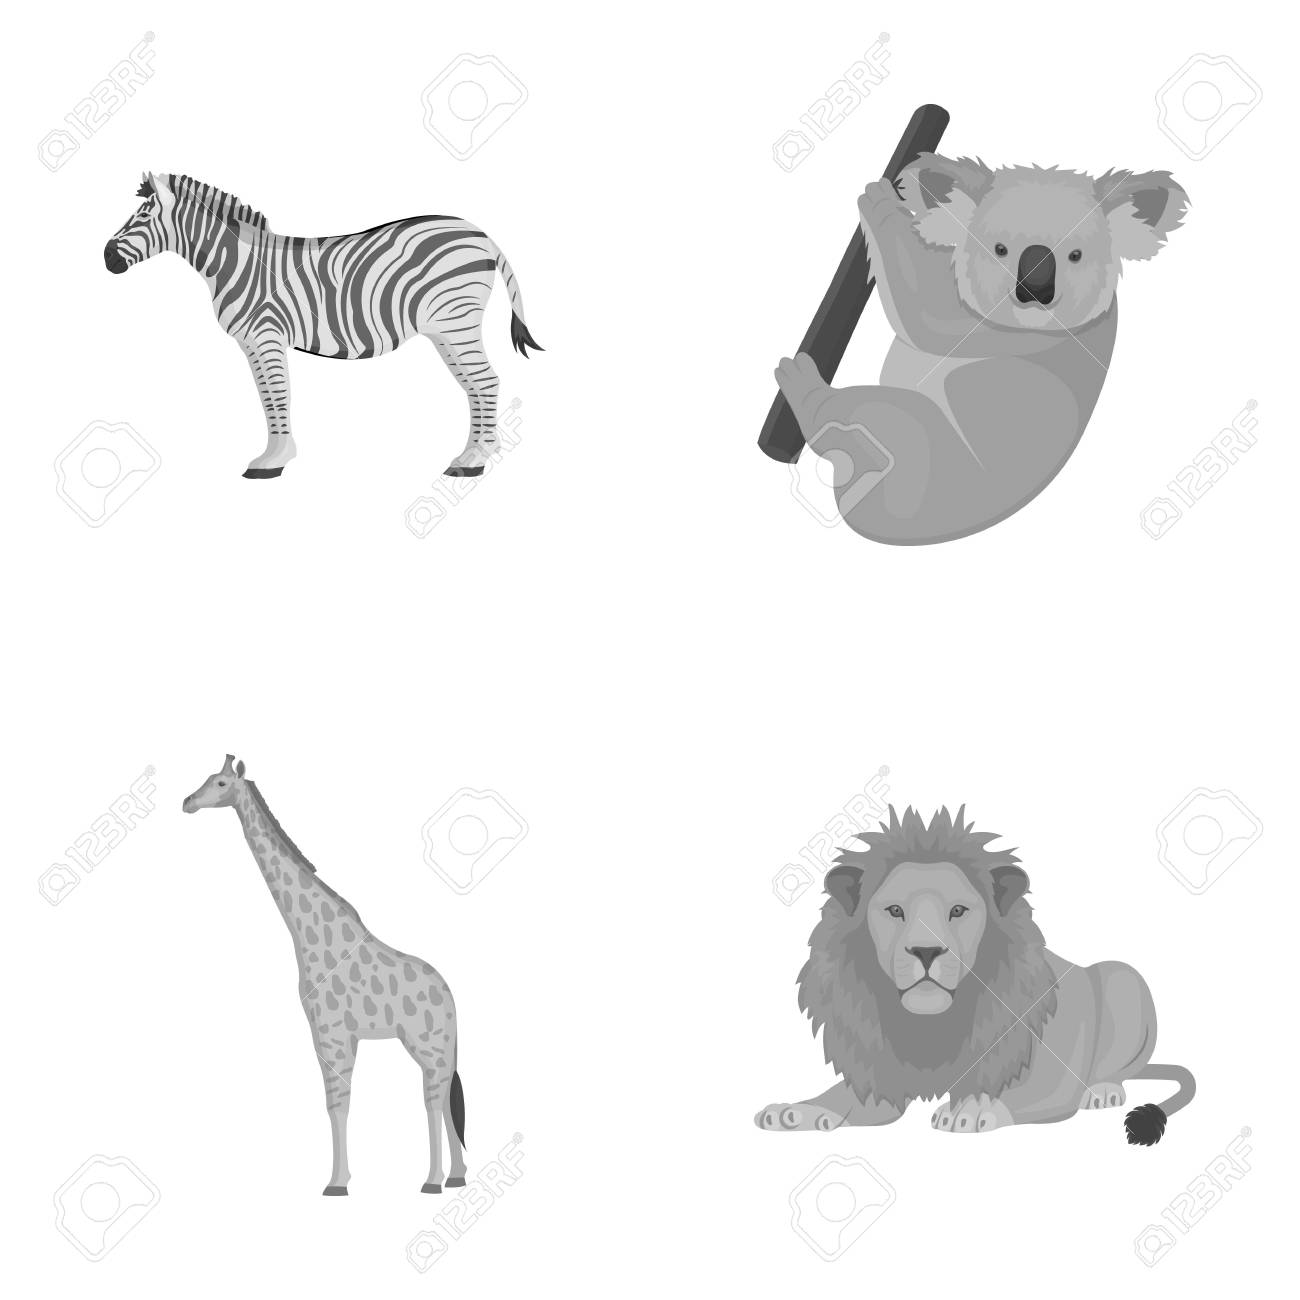 Cebra Africana, Koala Animal, Jirafa, Depredador Salvaje, León. Los ...